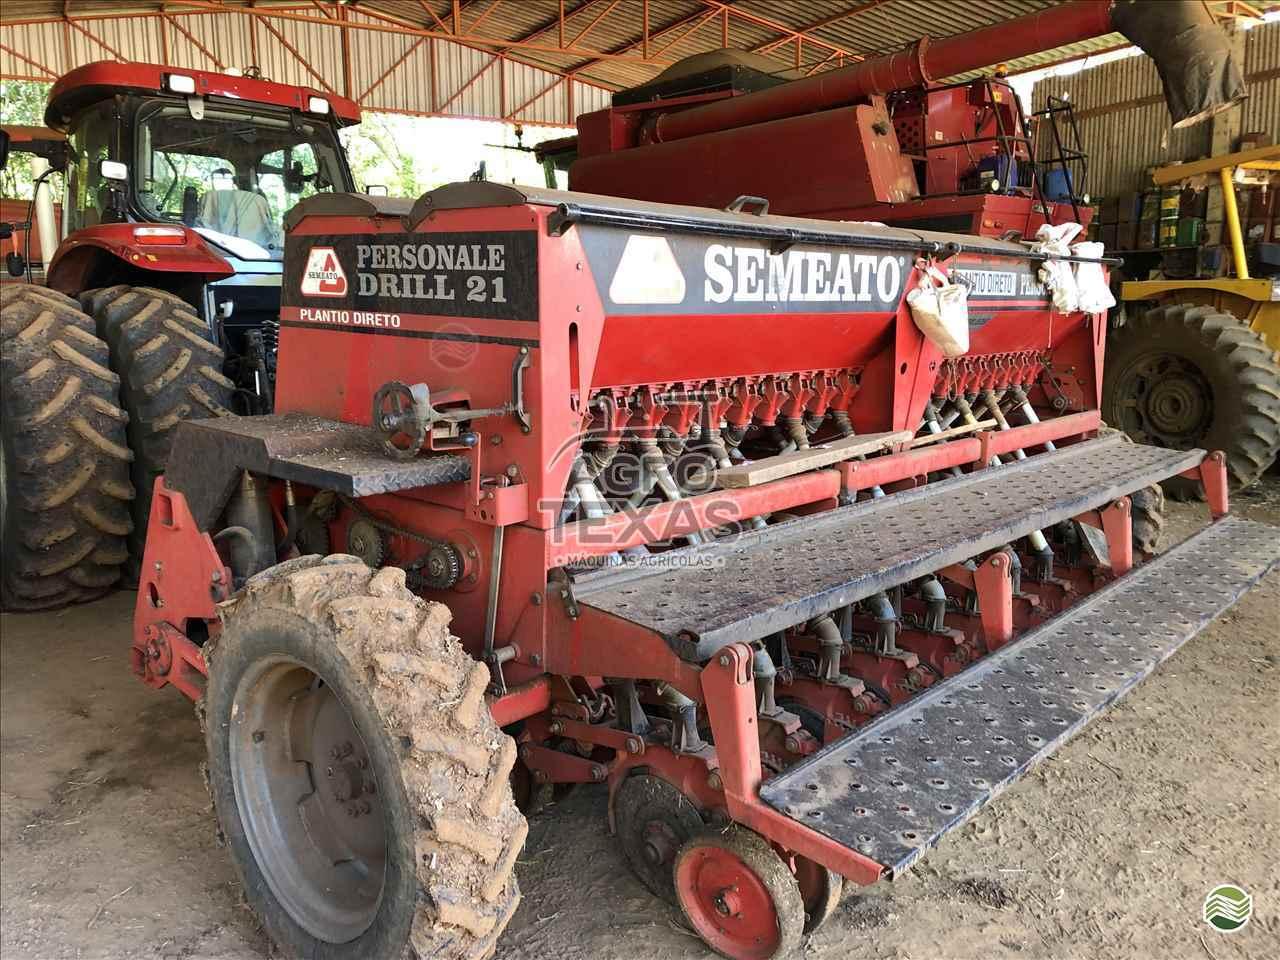 SEMEADEIRA SEMEATO PD 21 Agro Texas Máquinas Agrícolas VITORINO PARANÁ PR